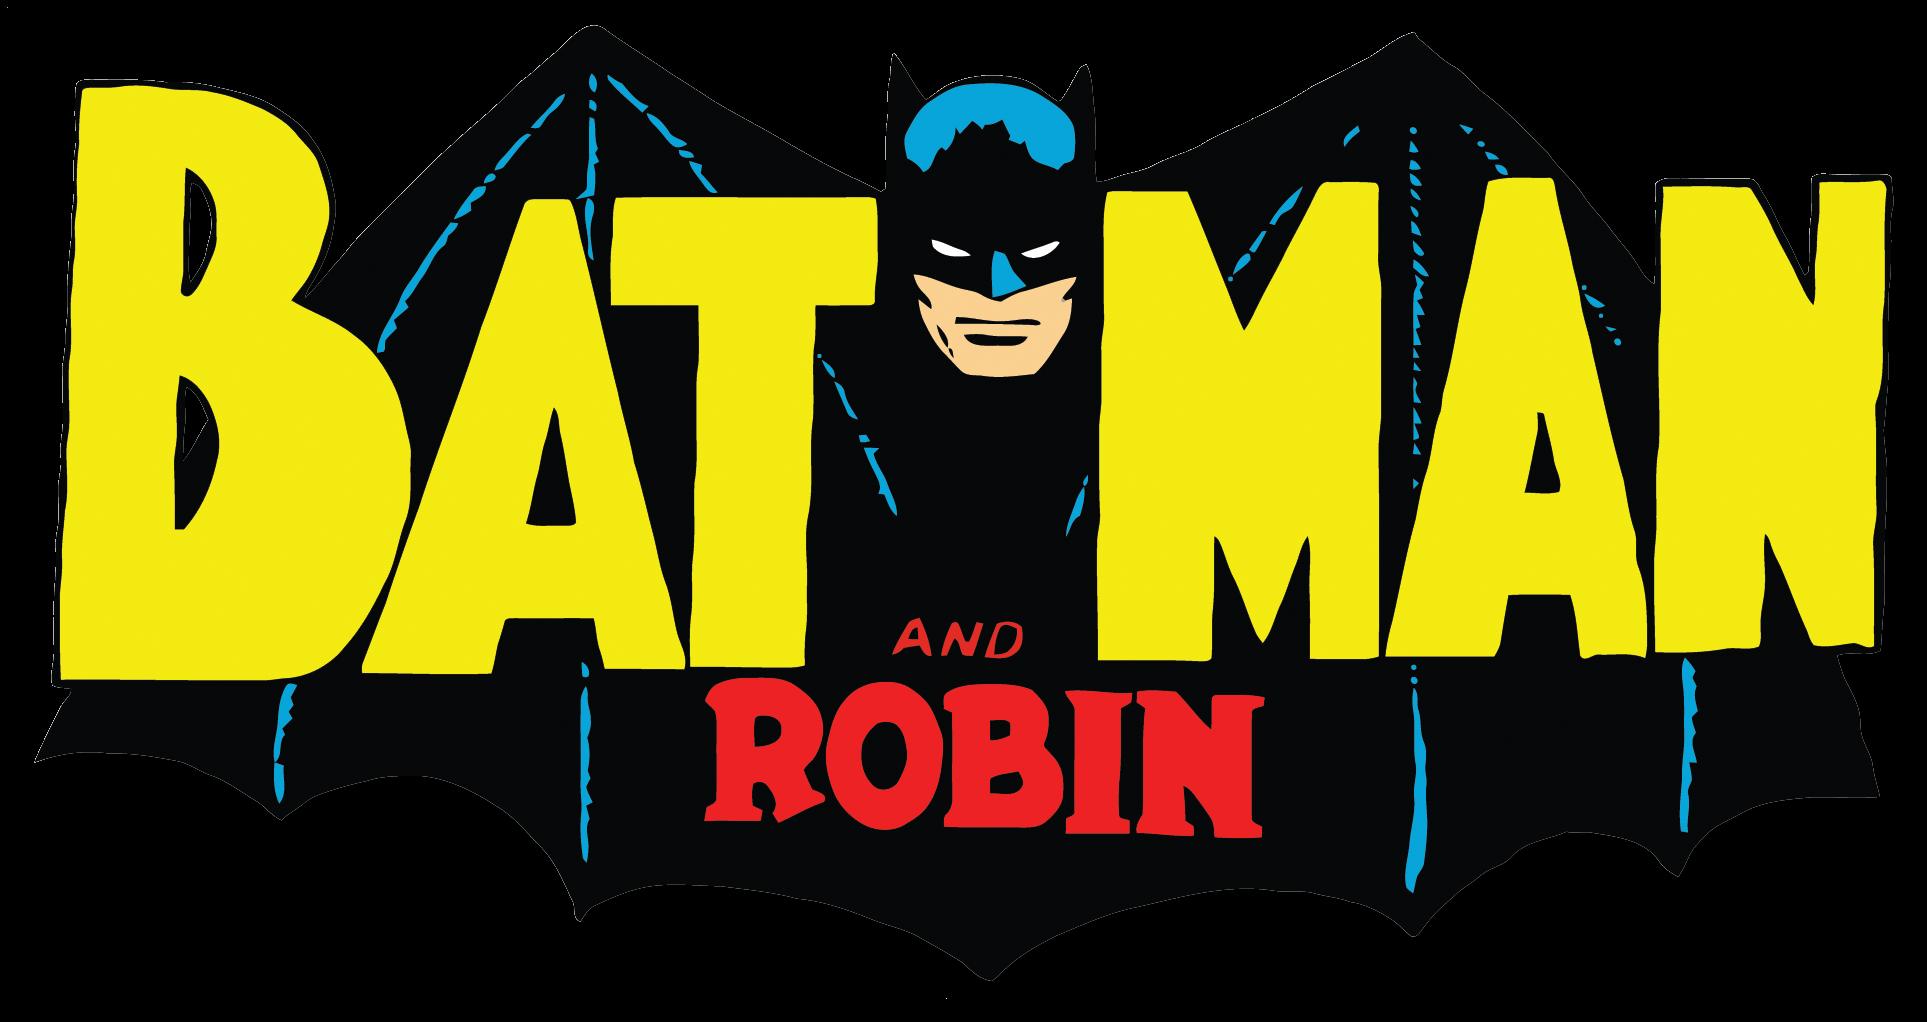 Batman clipart classic Bean525 bean525 d68bull  Image